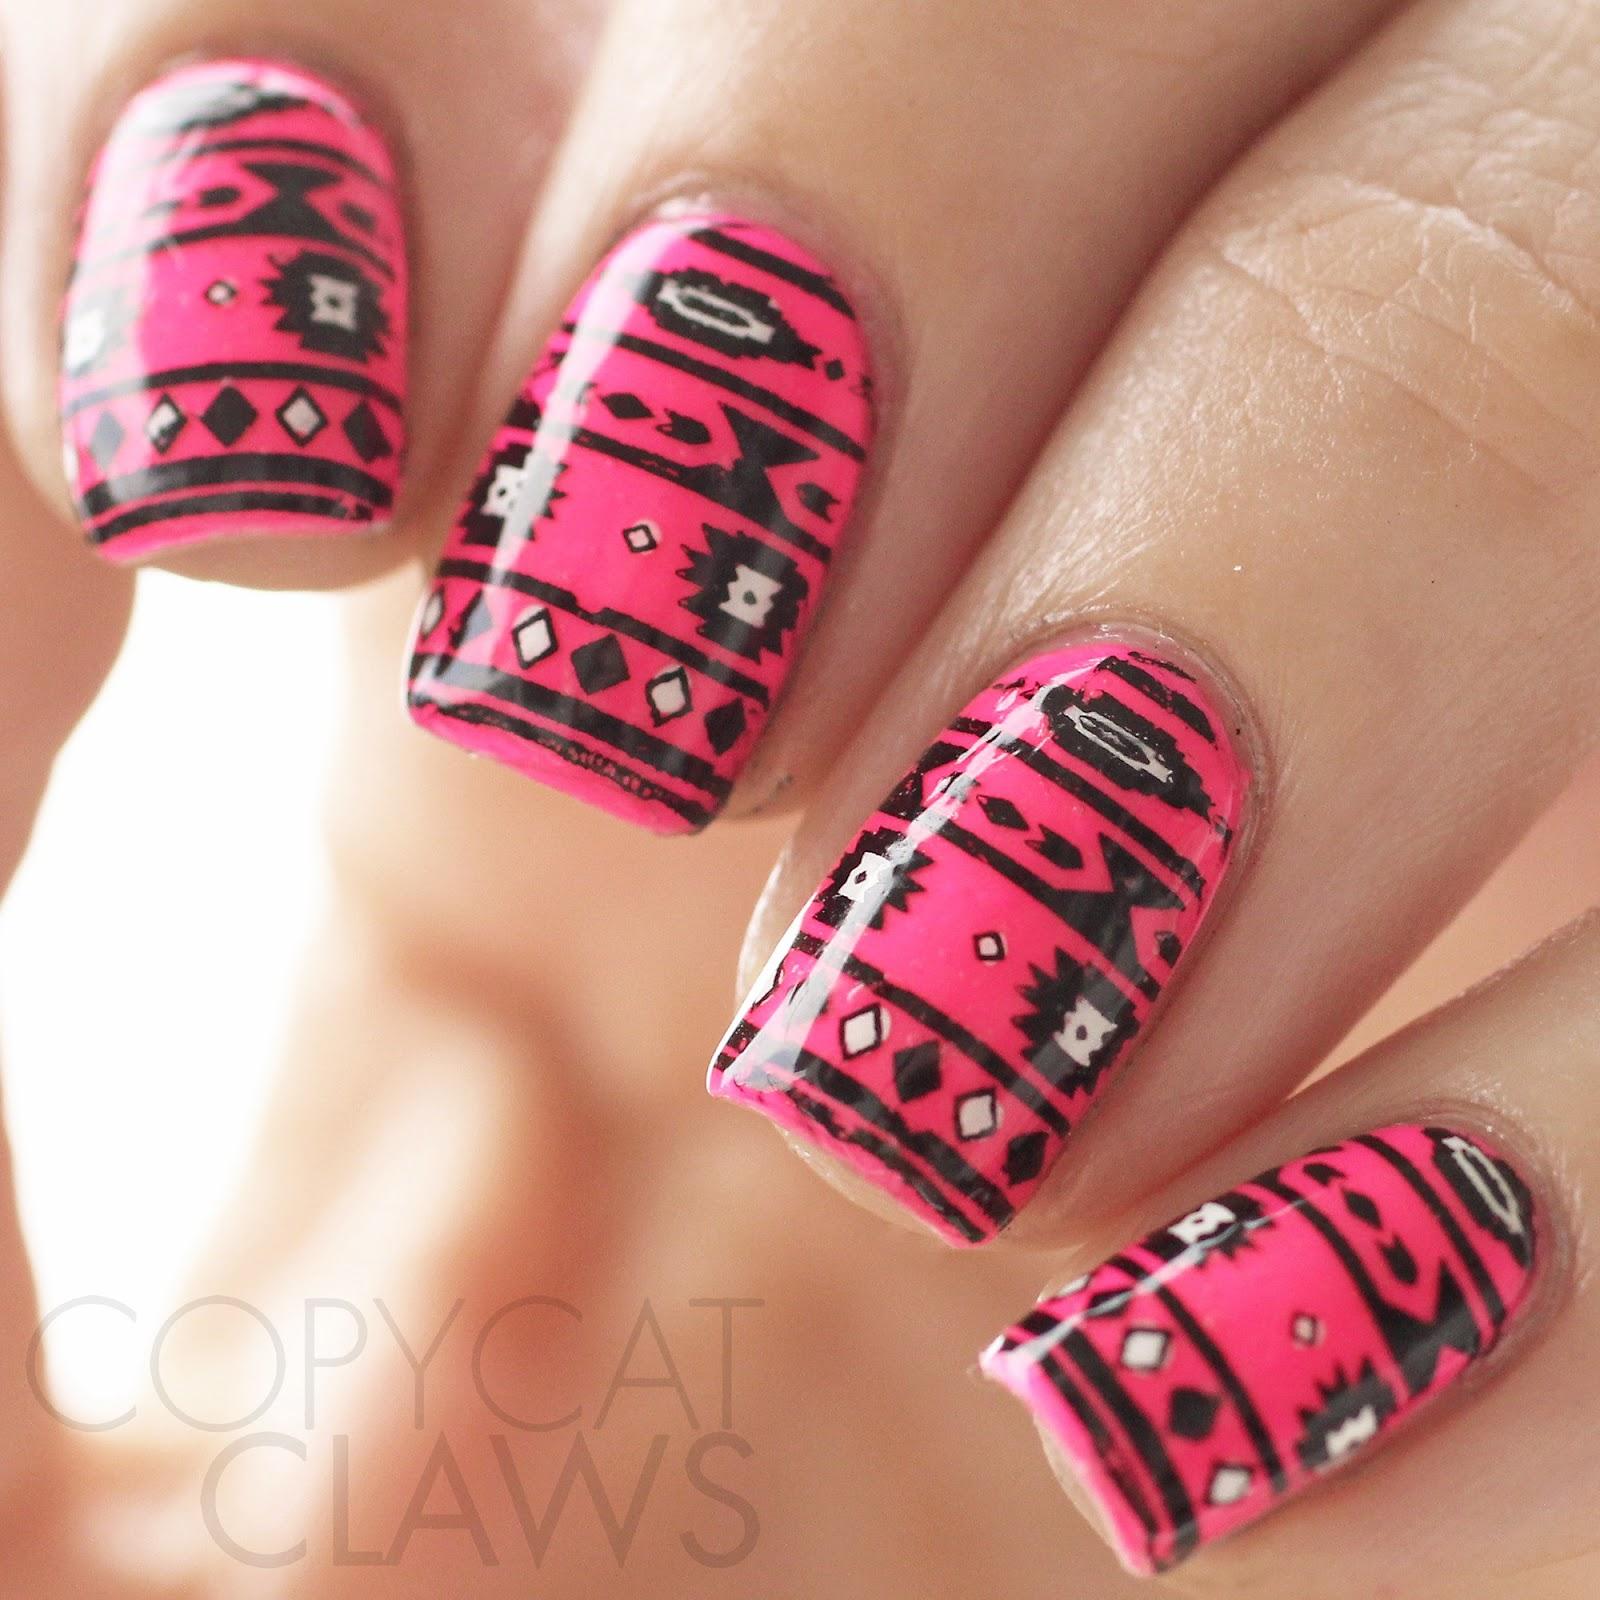 Copycat Claws: Hot Pink Tribal Nails